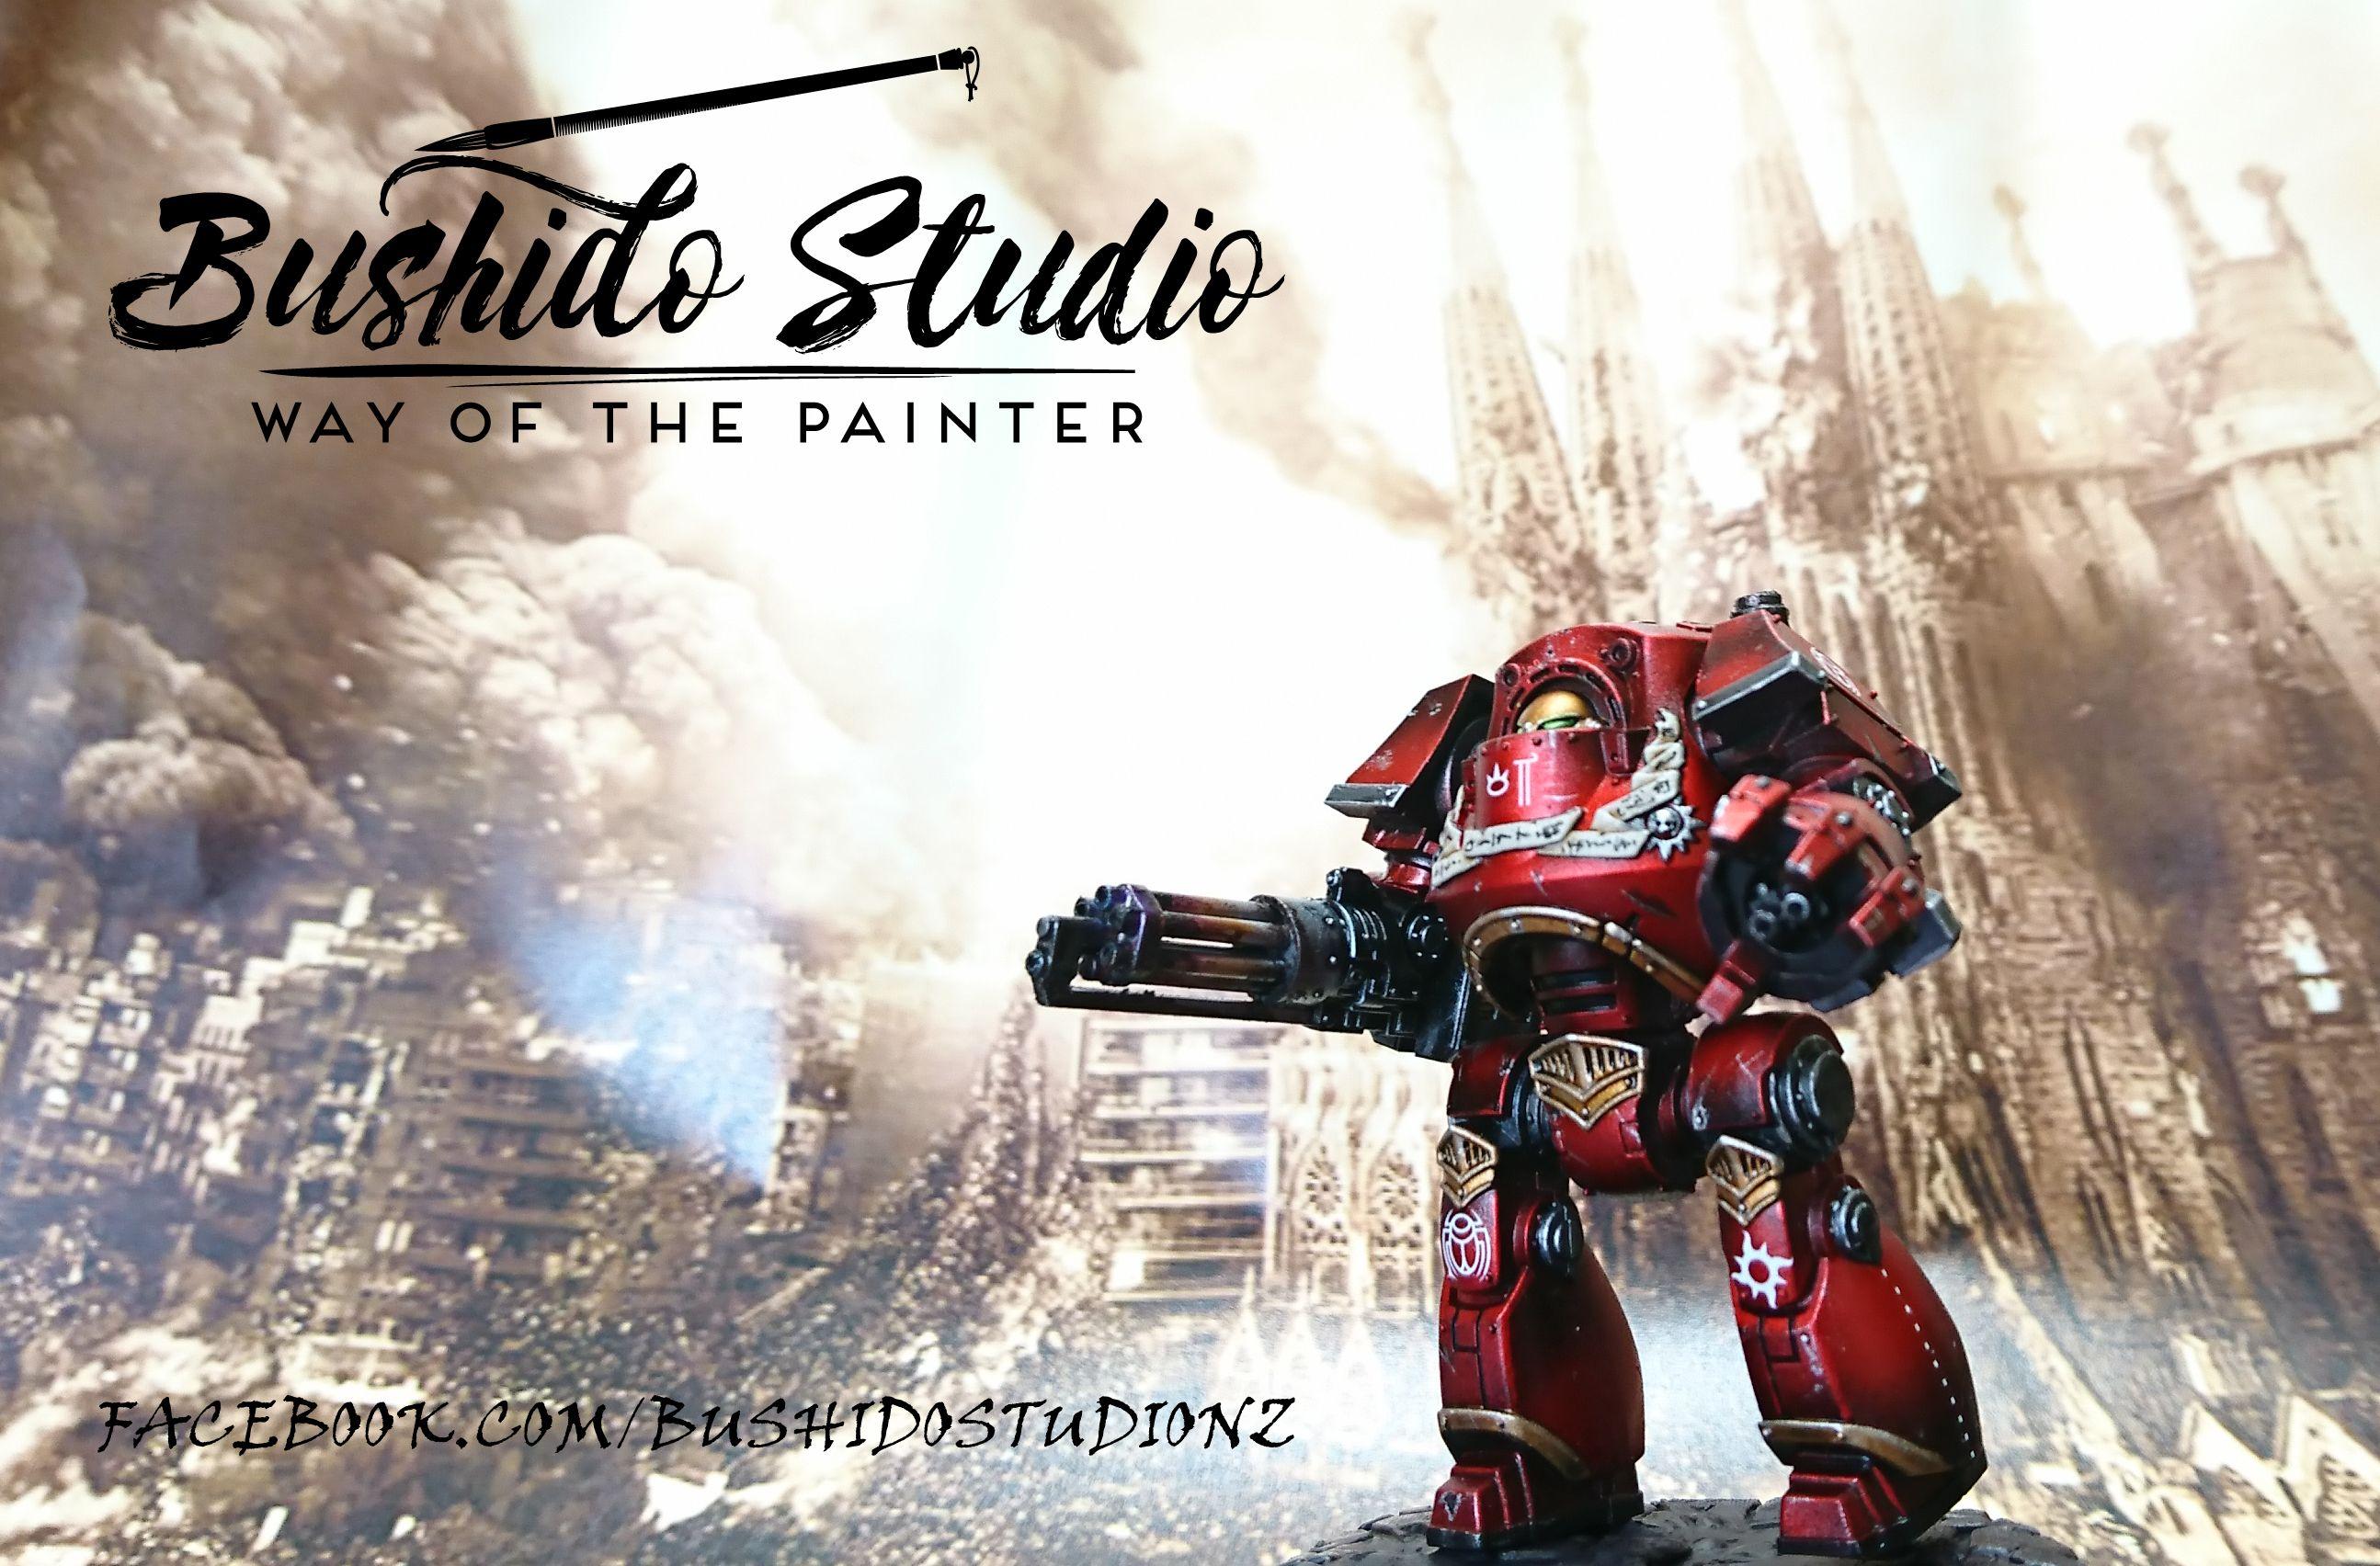 Warhammer 40k 30k Thousand Sons Contemptor Dreadnought Candy Red Metallic